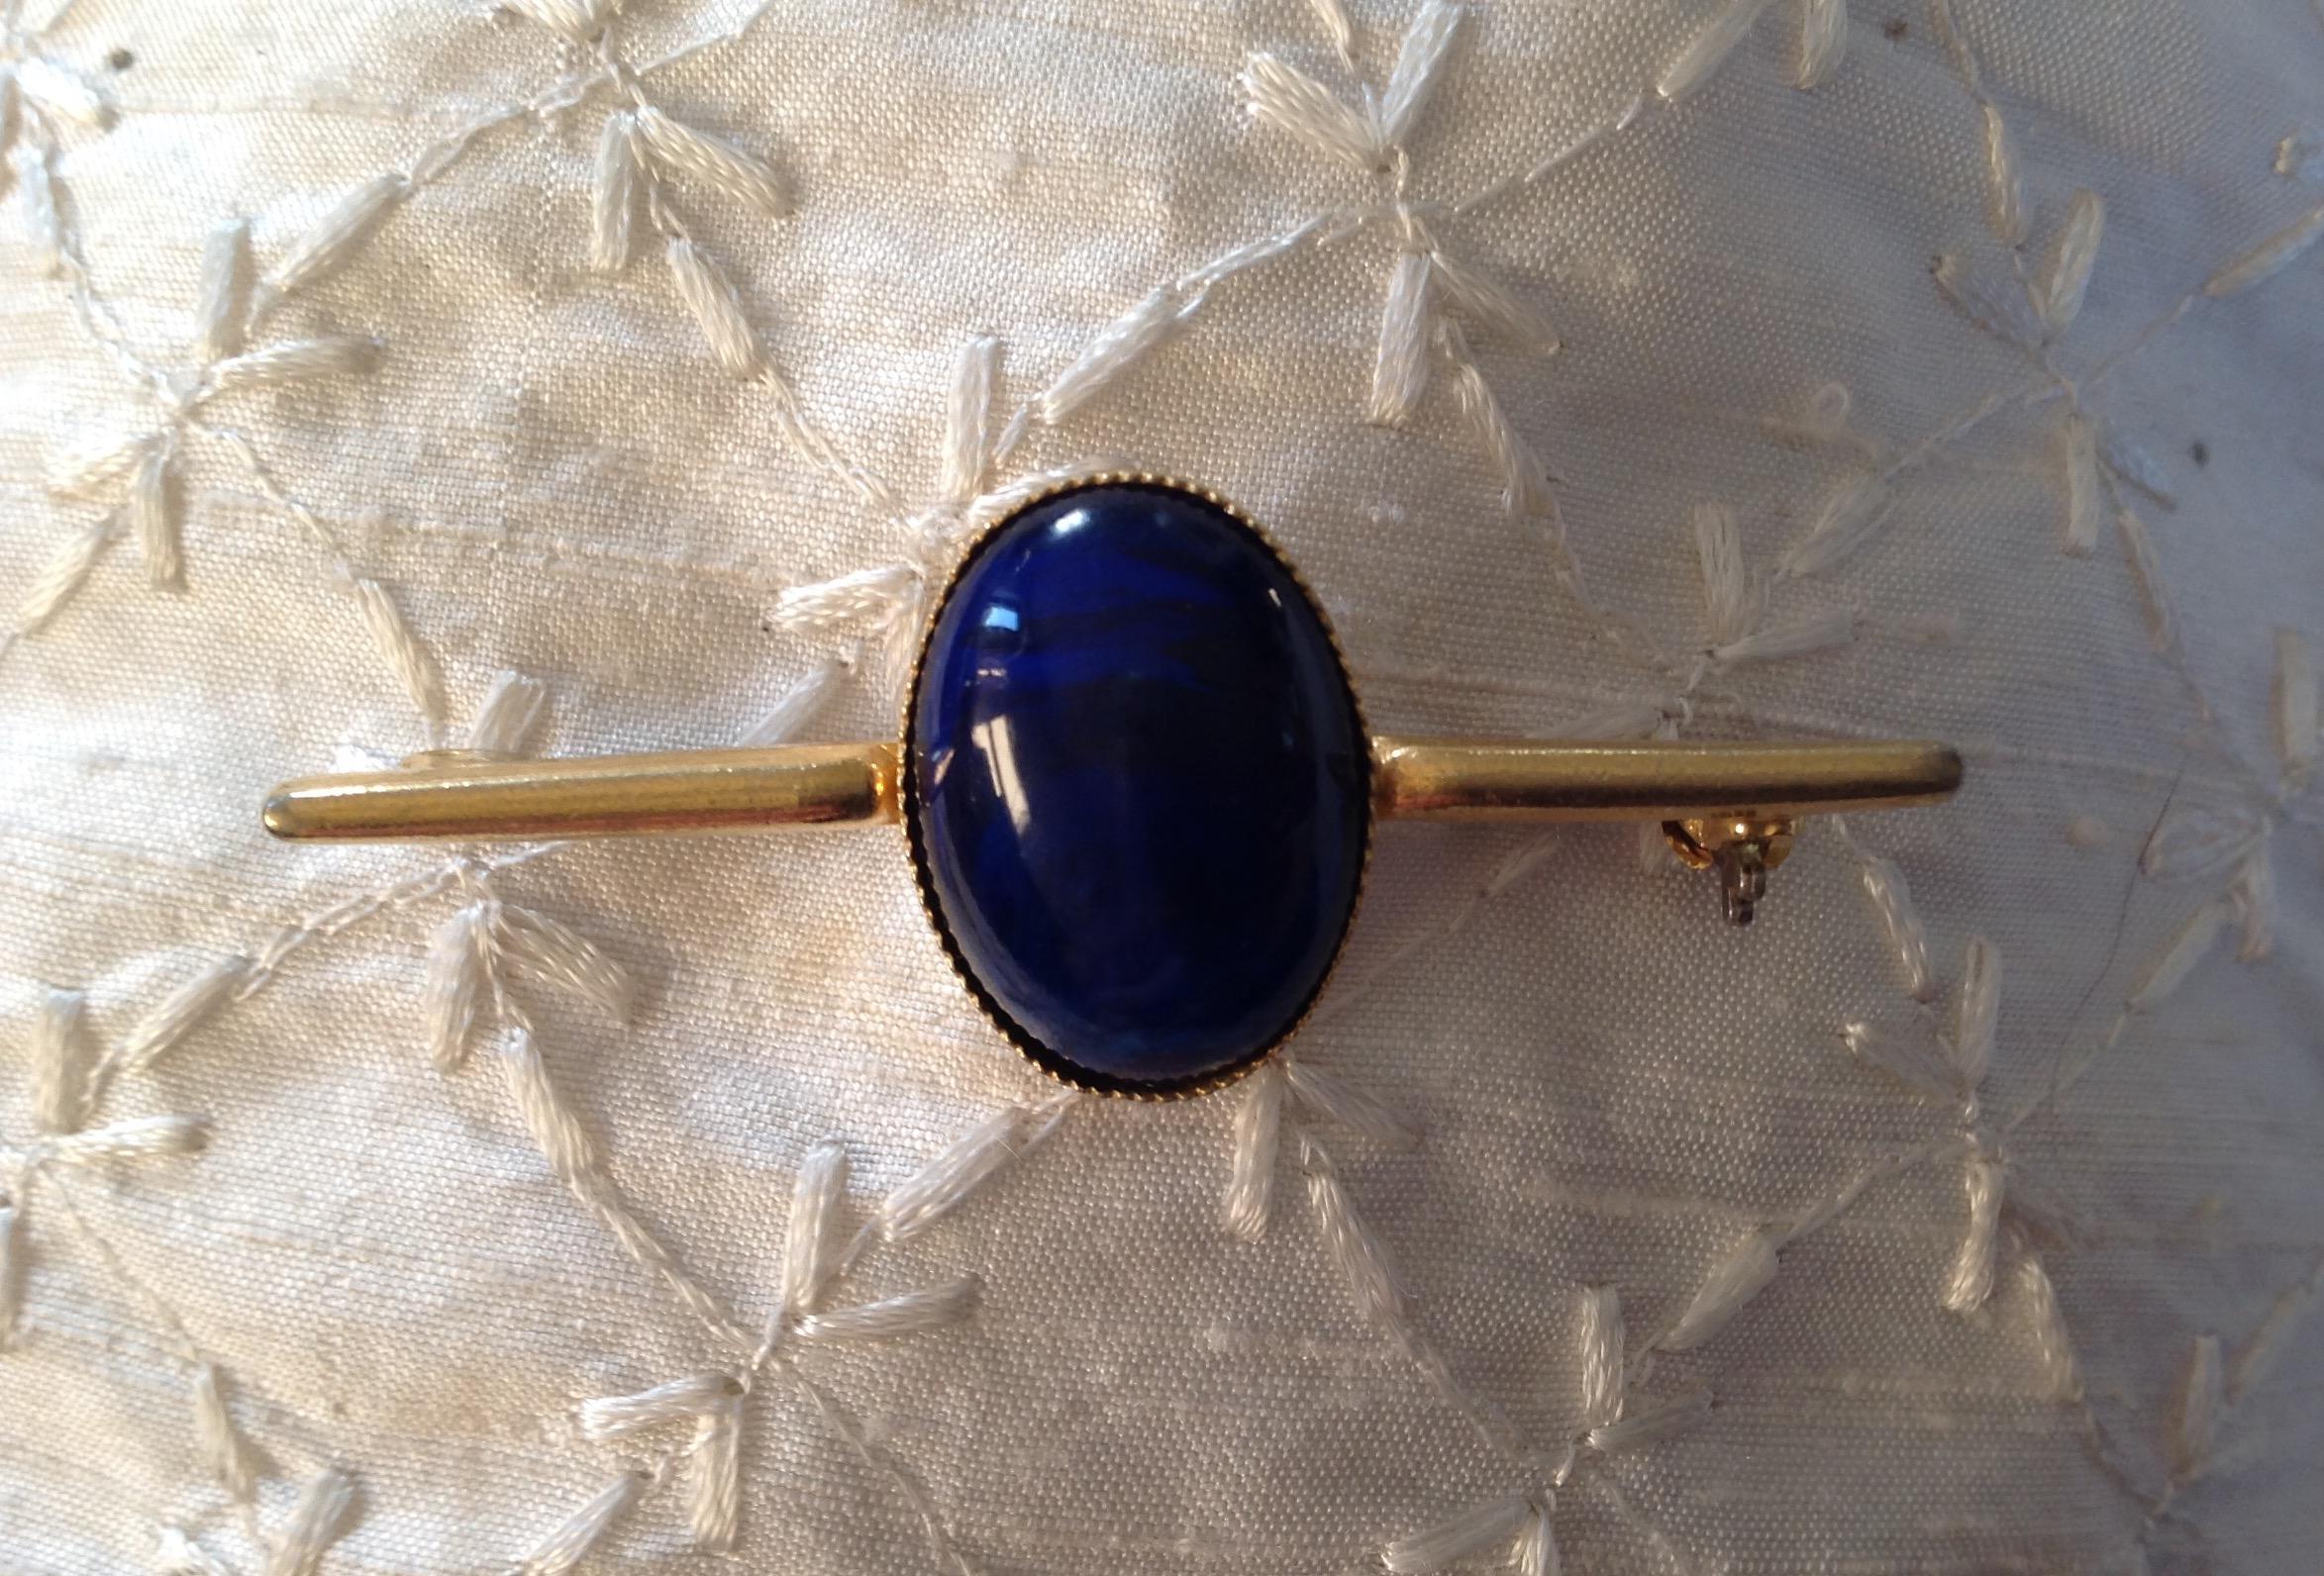 Vintage goldtone large central oval deep blue cabachon stock pin